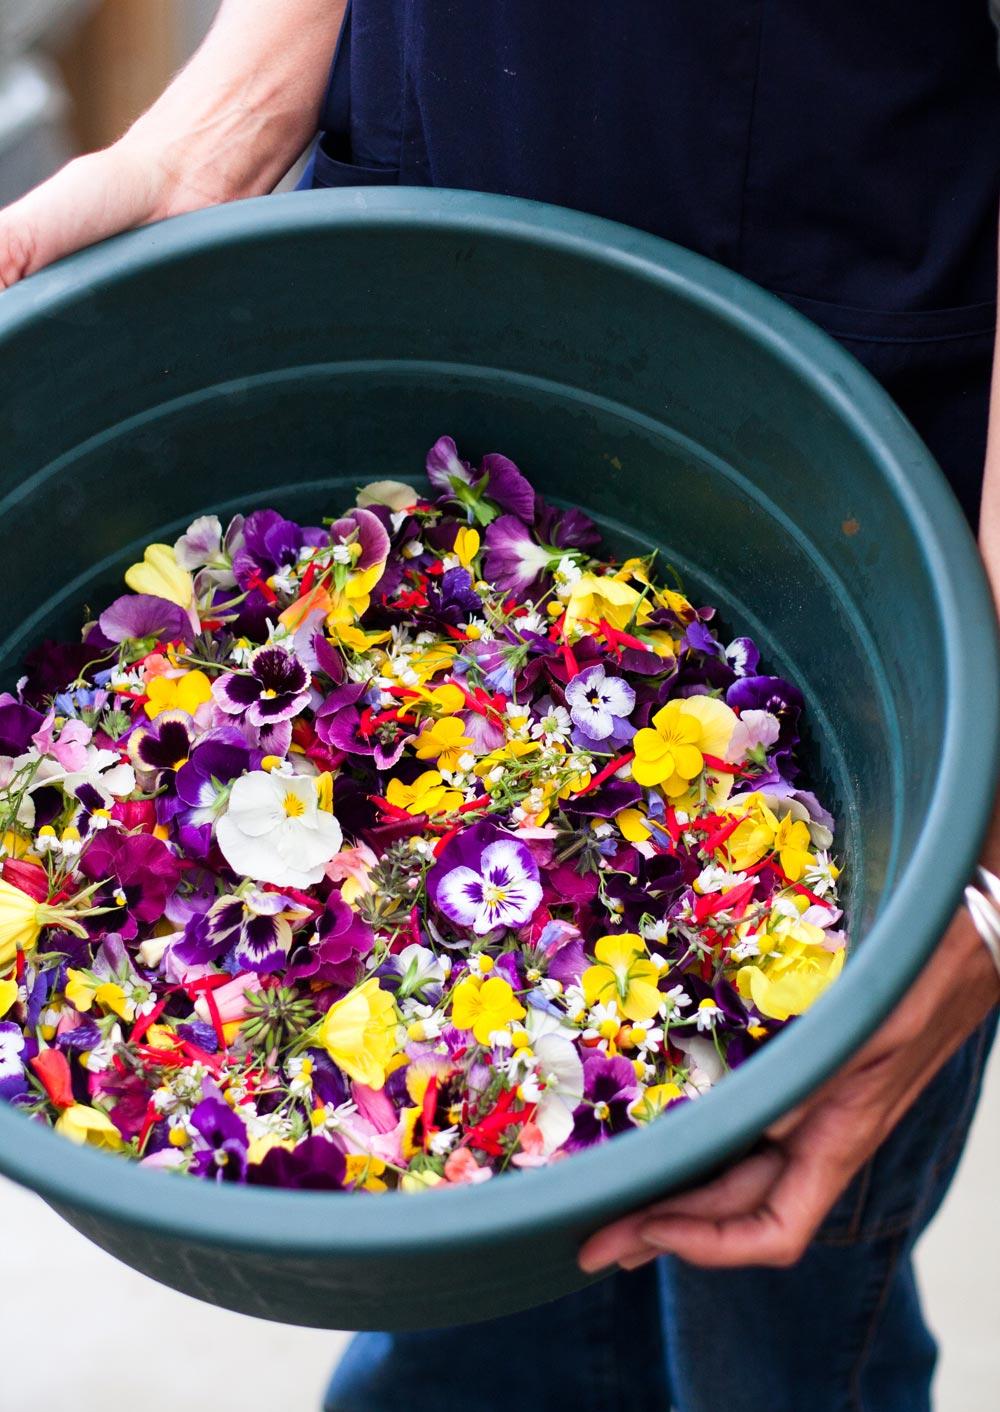 boschendal_werf_vegetable_garden_edible_flowers